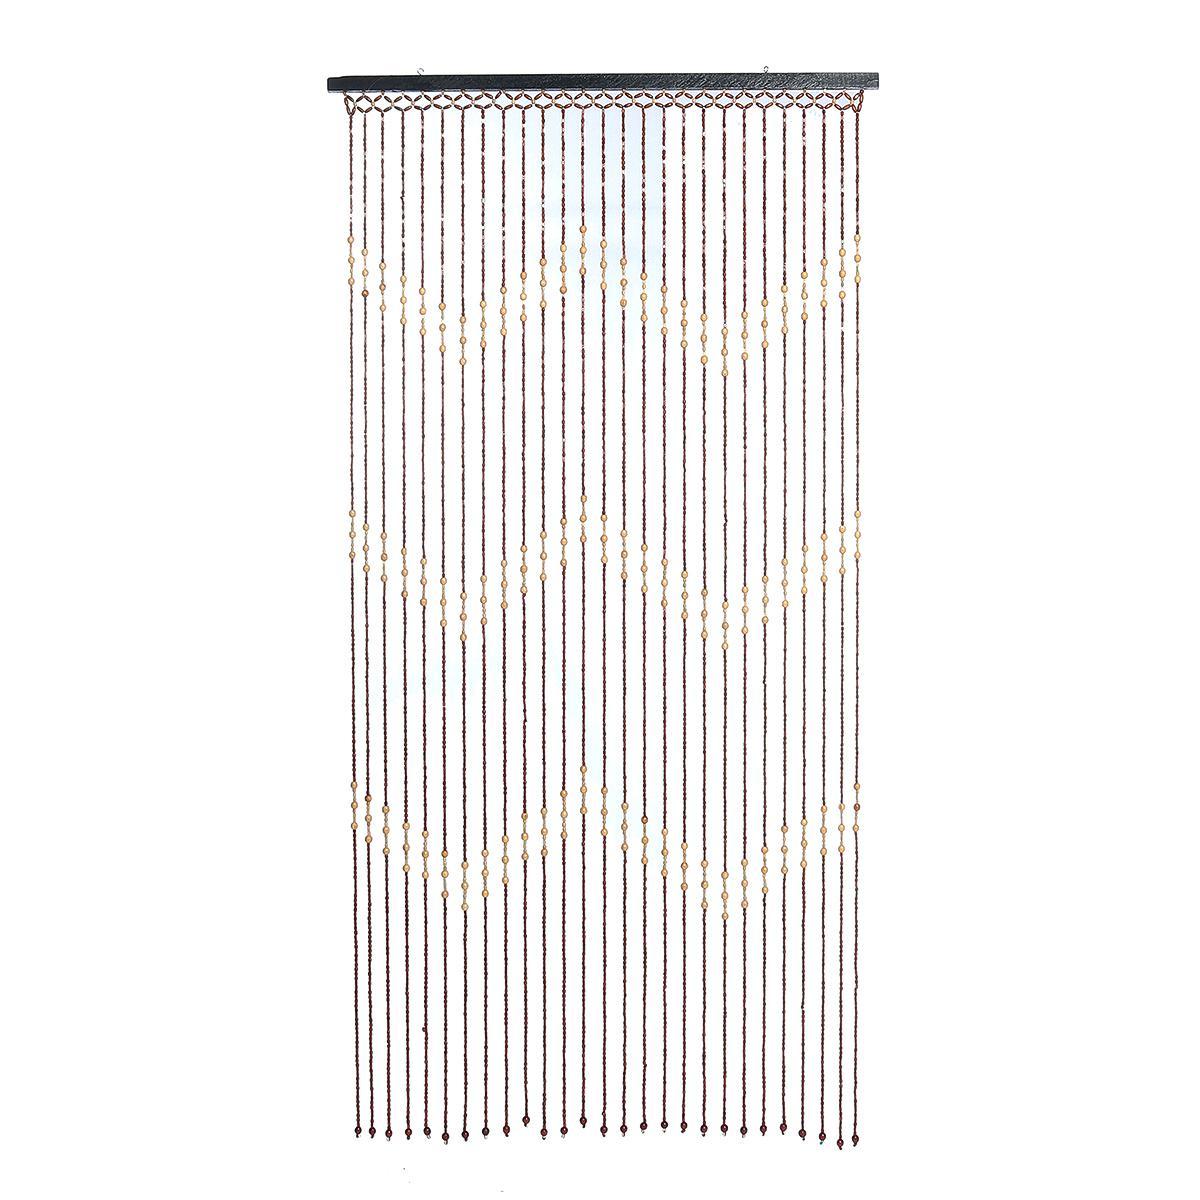 Fashion Wooden Beads Door Curtain Blinds Handmade Fly Screen Wooden Beaded Balcony Room Divider Decor 90x175cm Matt Blatt